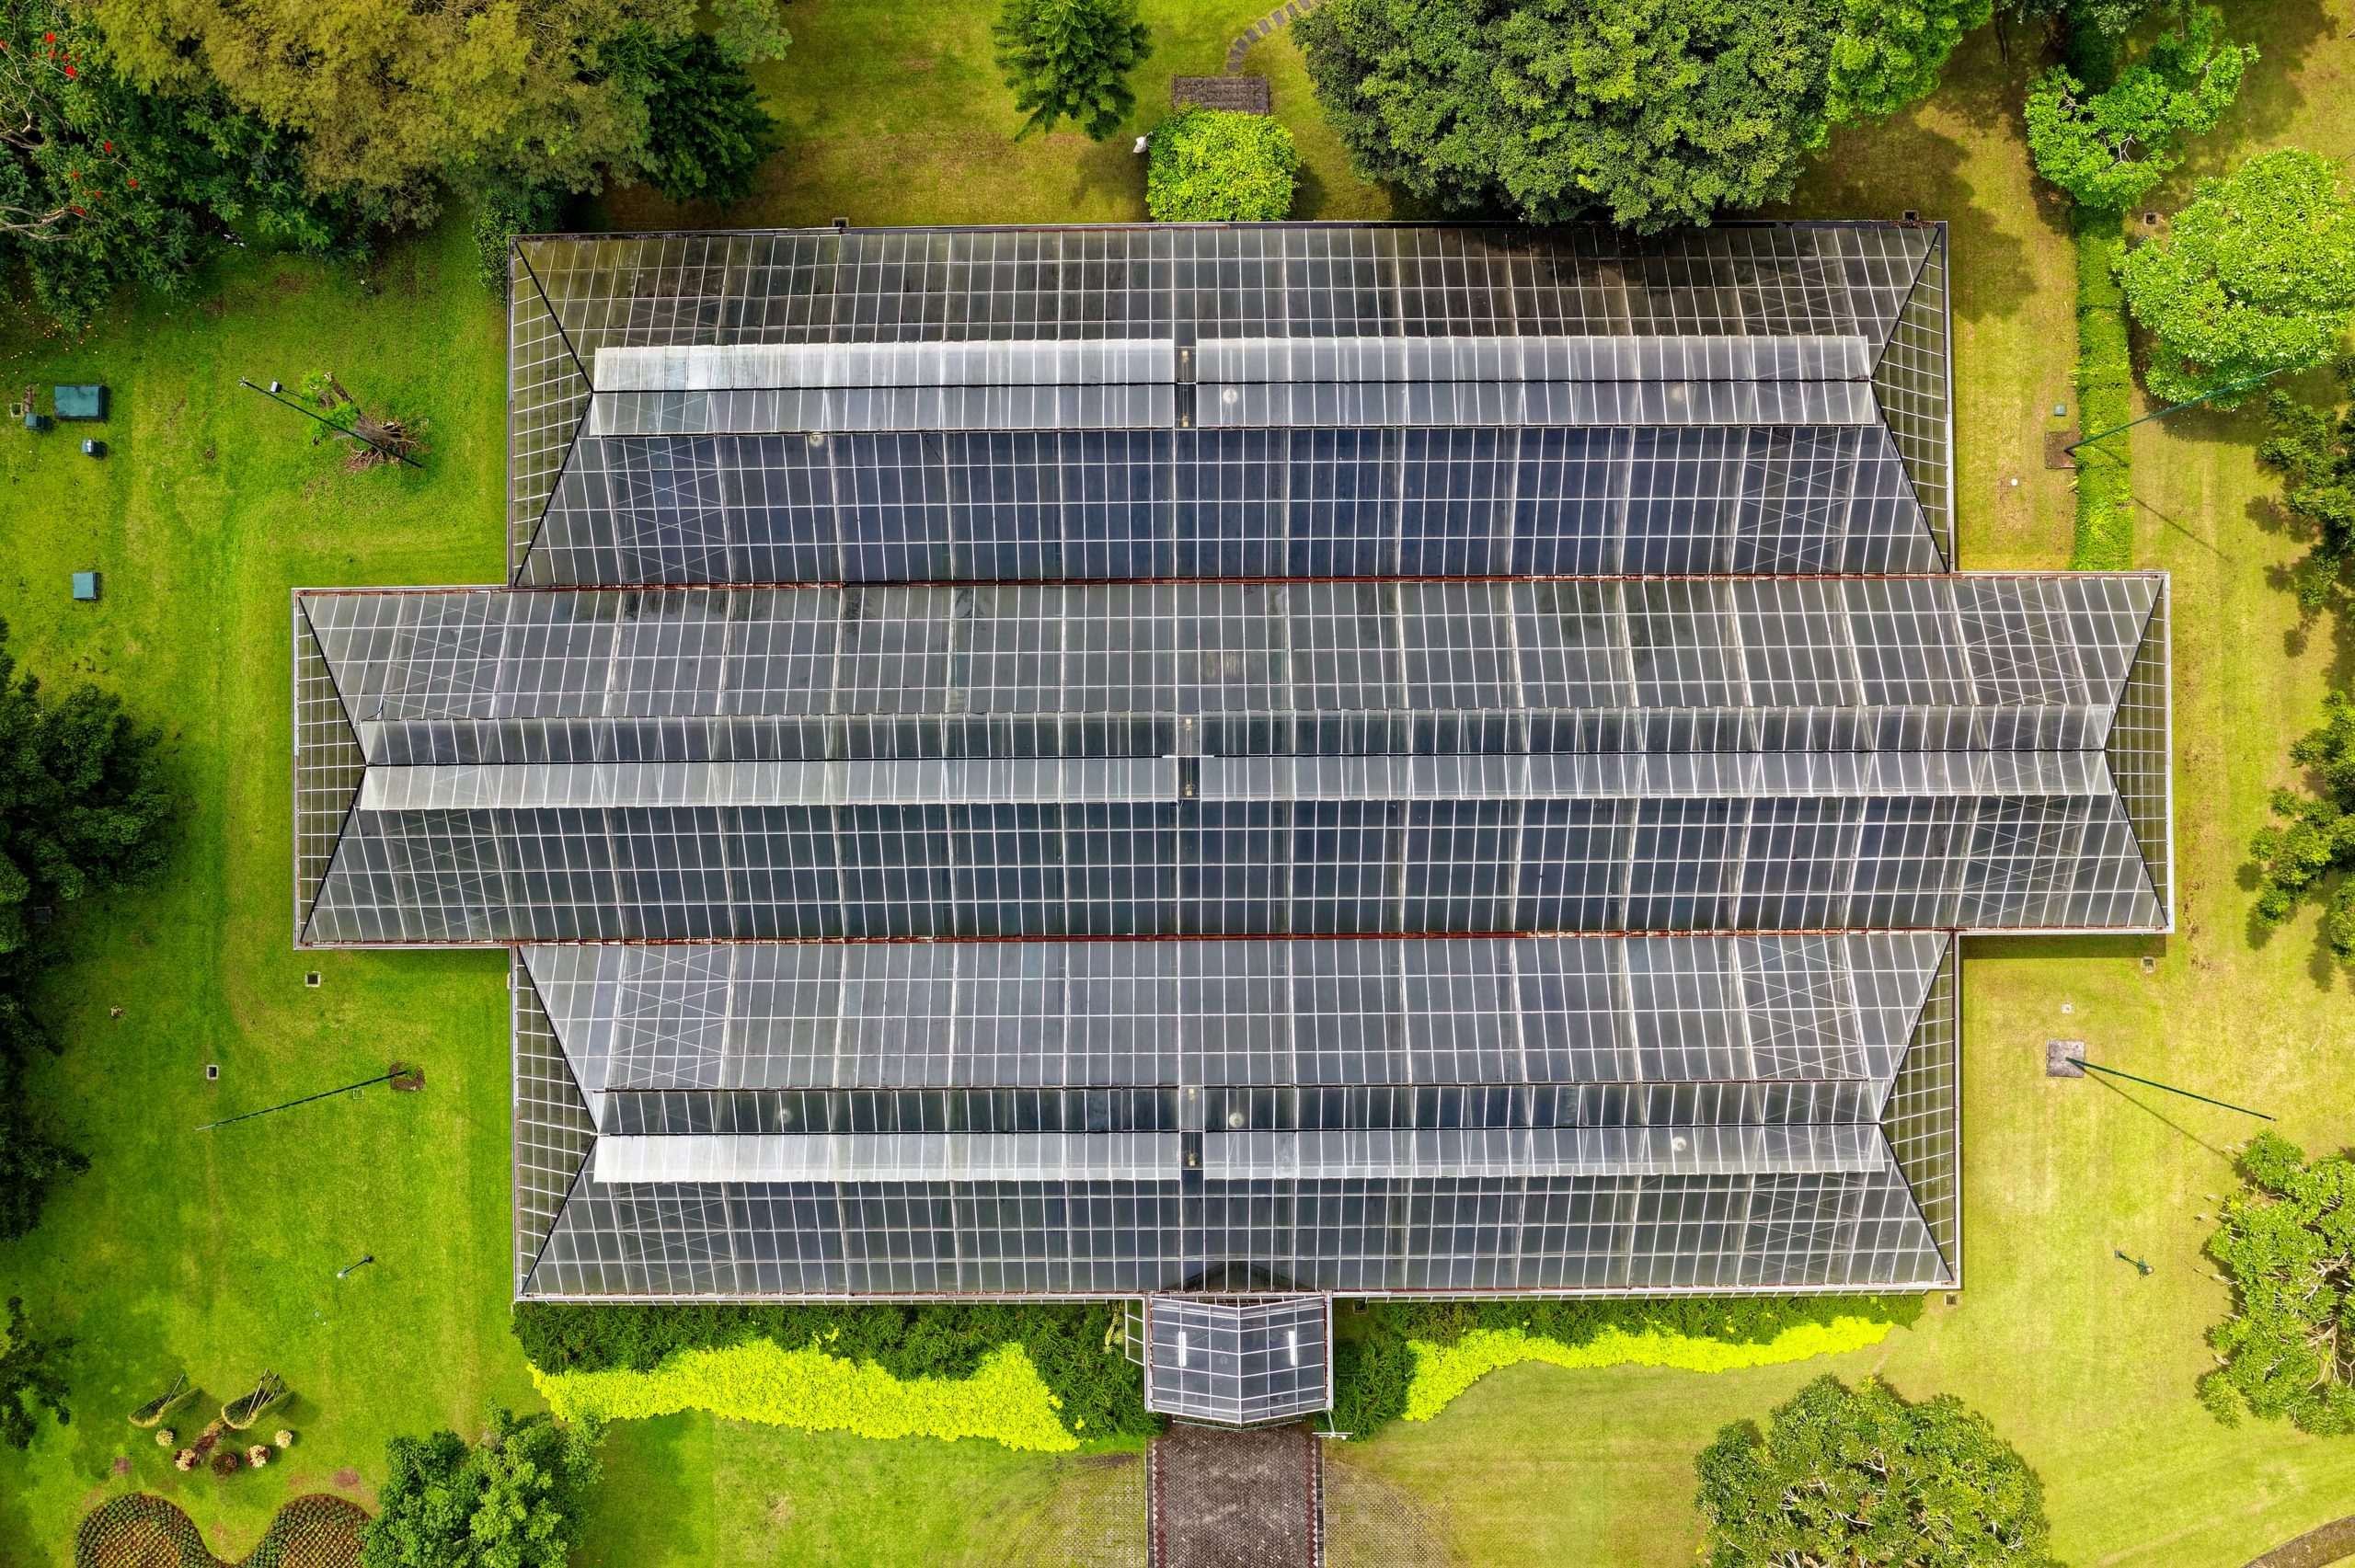 Danaos for Renewable energy grids